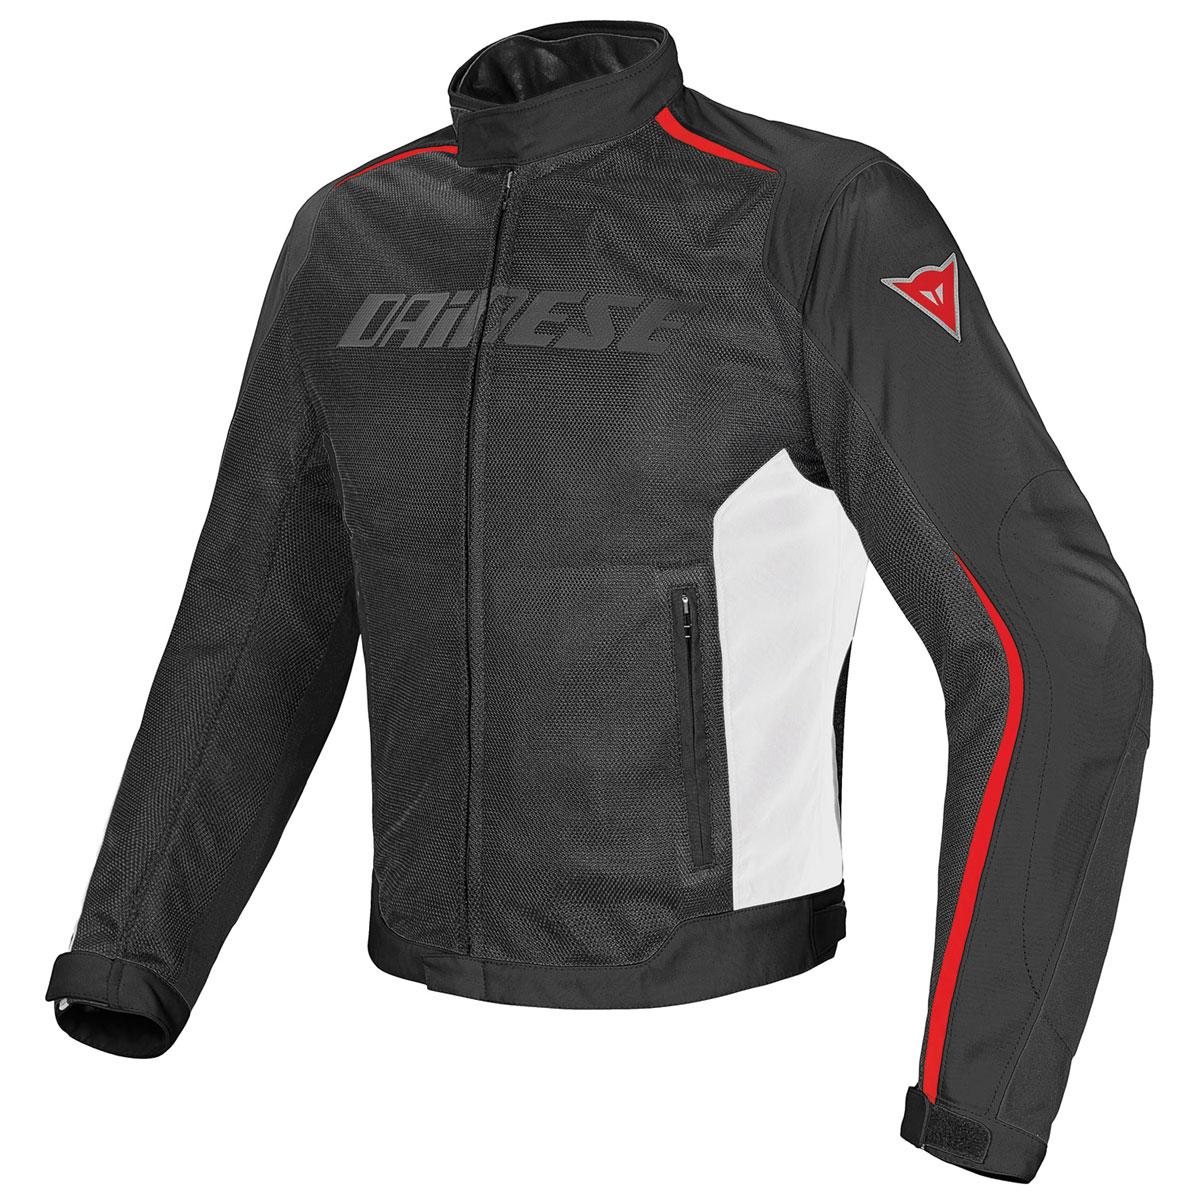 Dainese Men's Hydra Flux D-Dry Black/White/Red Jacket